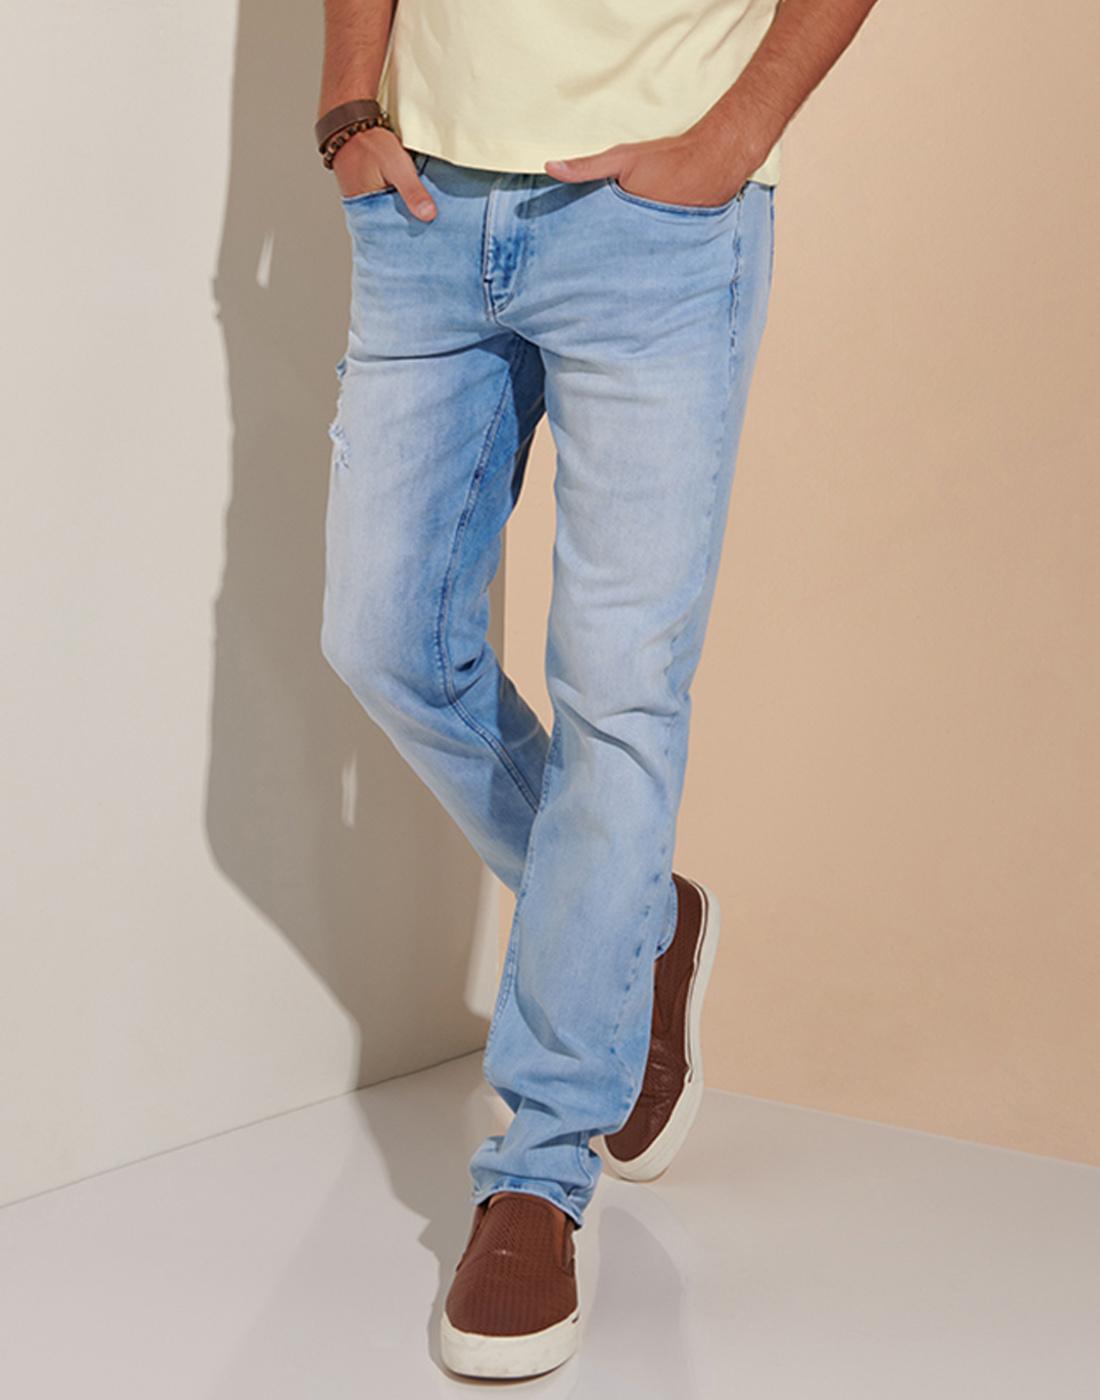 Calça Masc. Just Fit Jeans Destroyer Six One